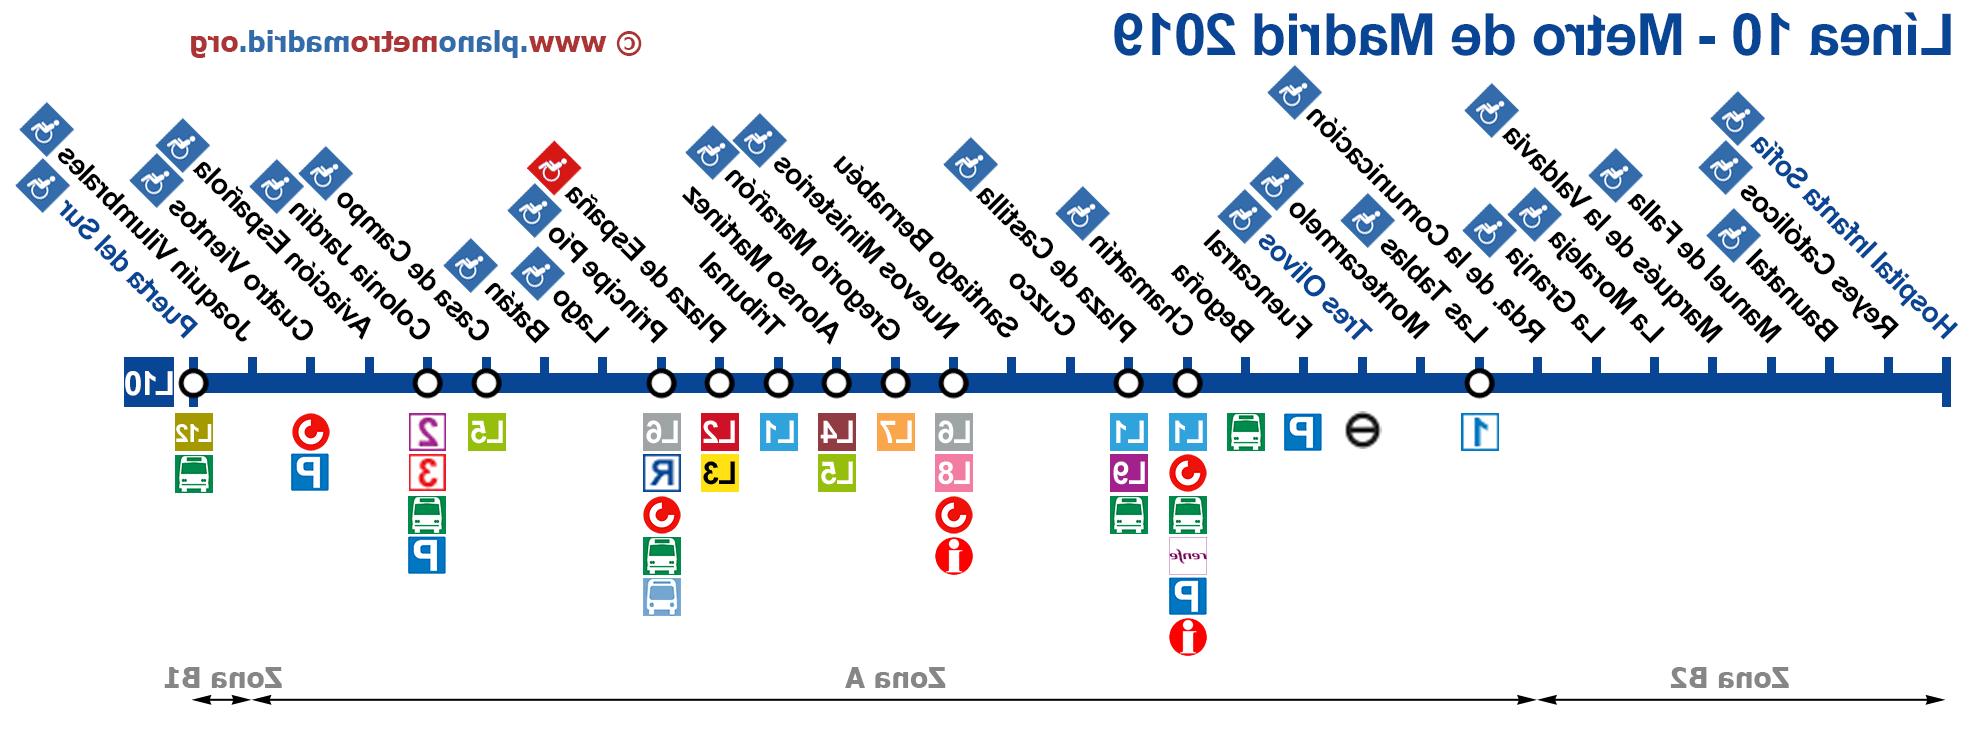 Horarios De Metro Madrid 4pde LÃ Nea 10 Del Metro De Madrid L10 Actualizado 2018